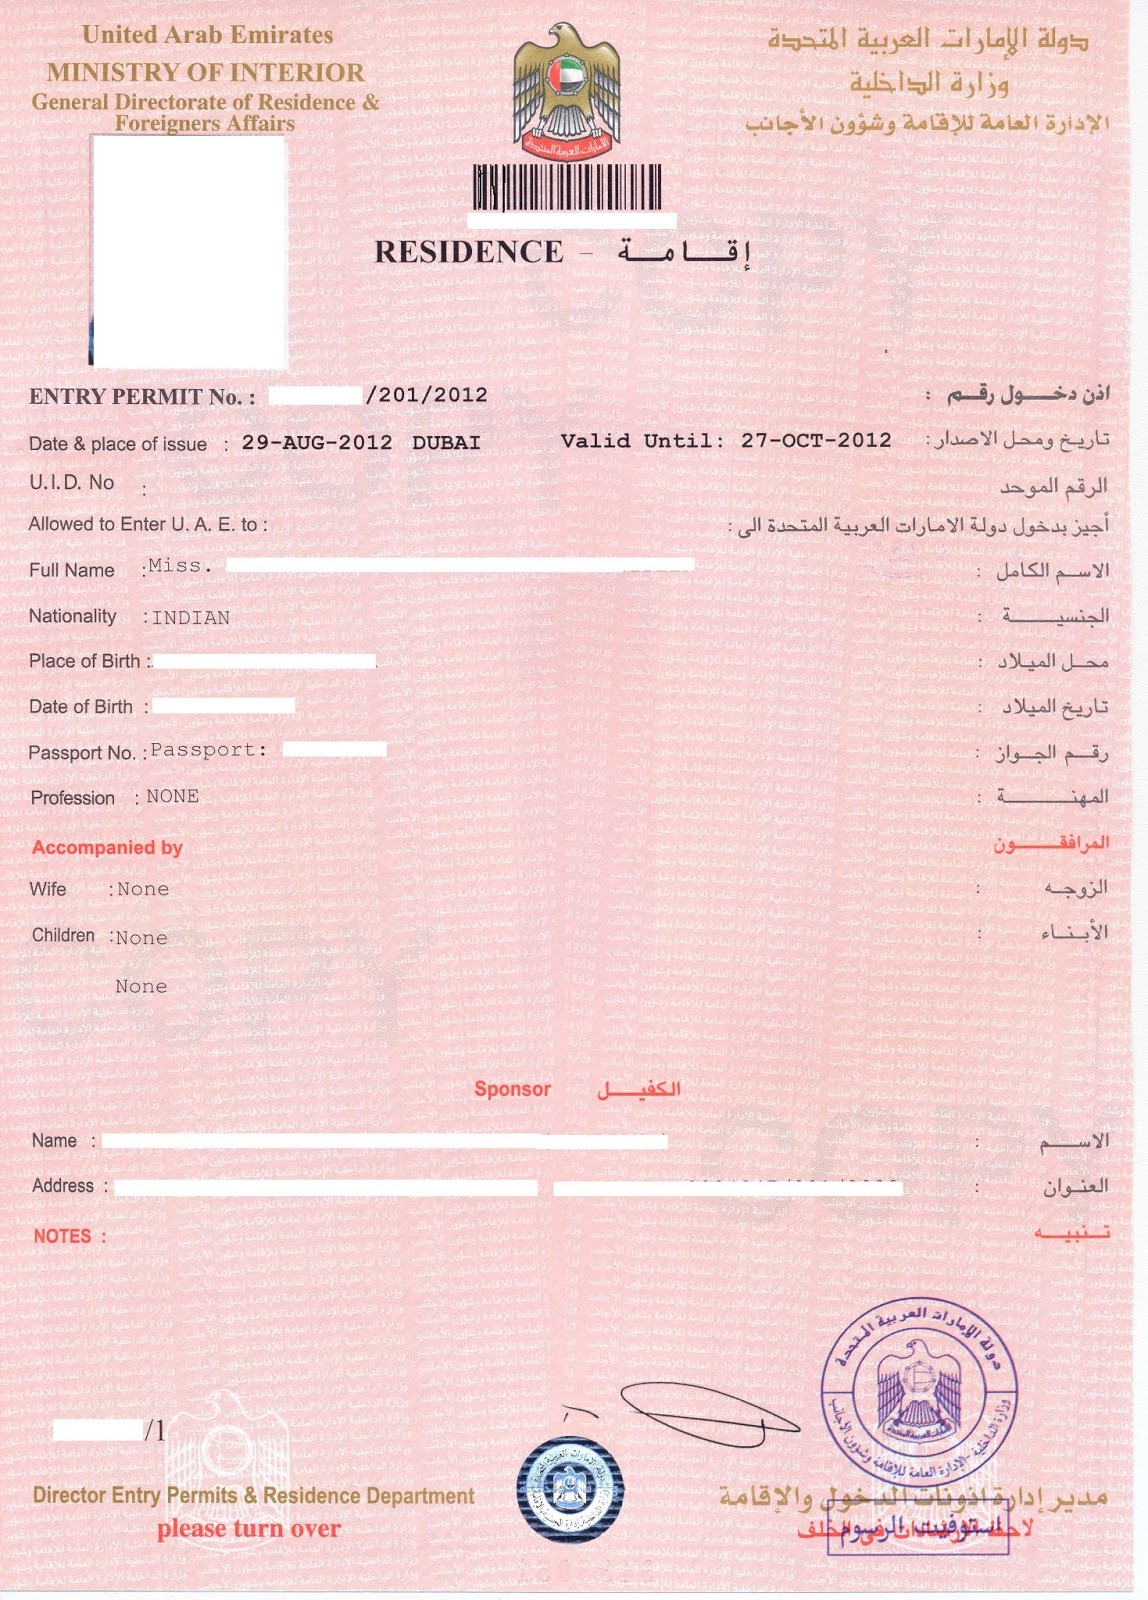 UAE Visa: Residence Entry Permit Expiration